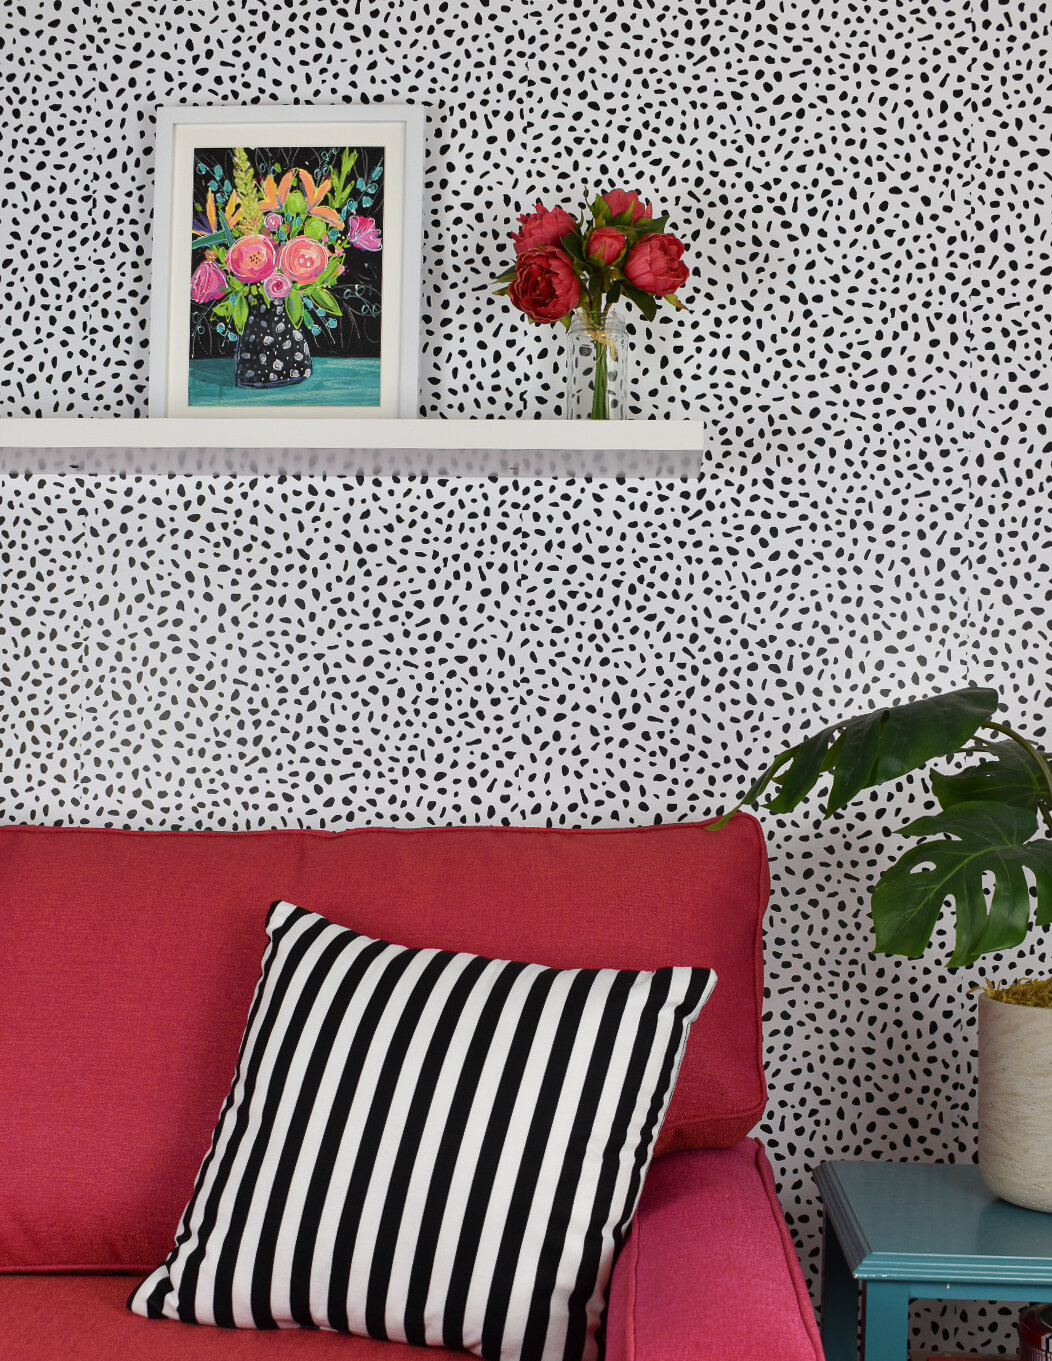 boho_painting_flowers_eclectic_daisyfaithart_3.jpg